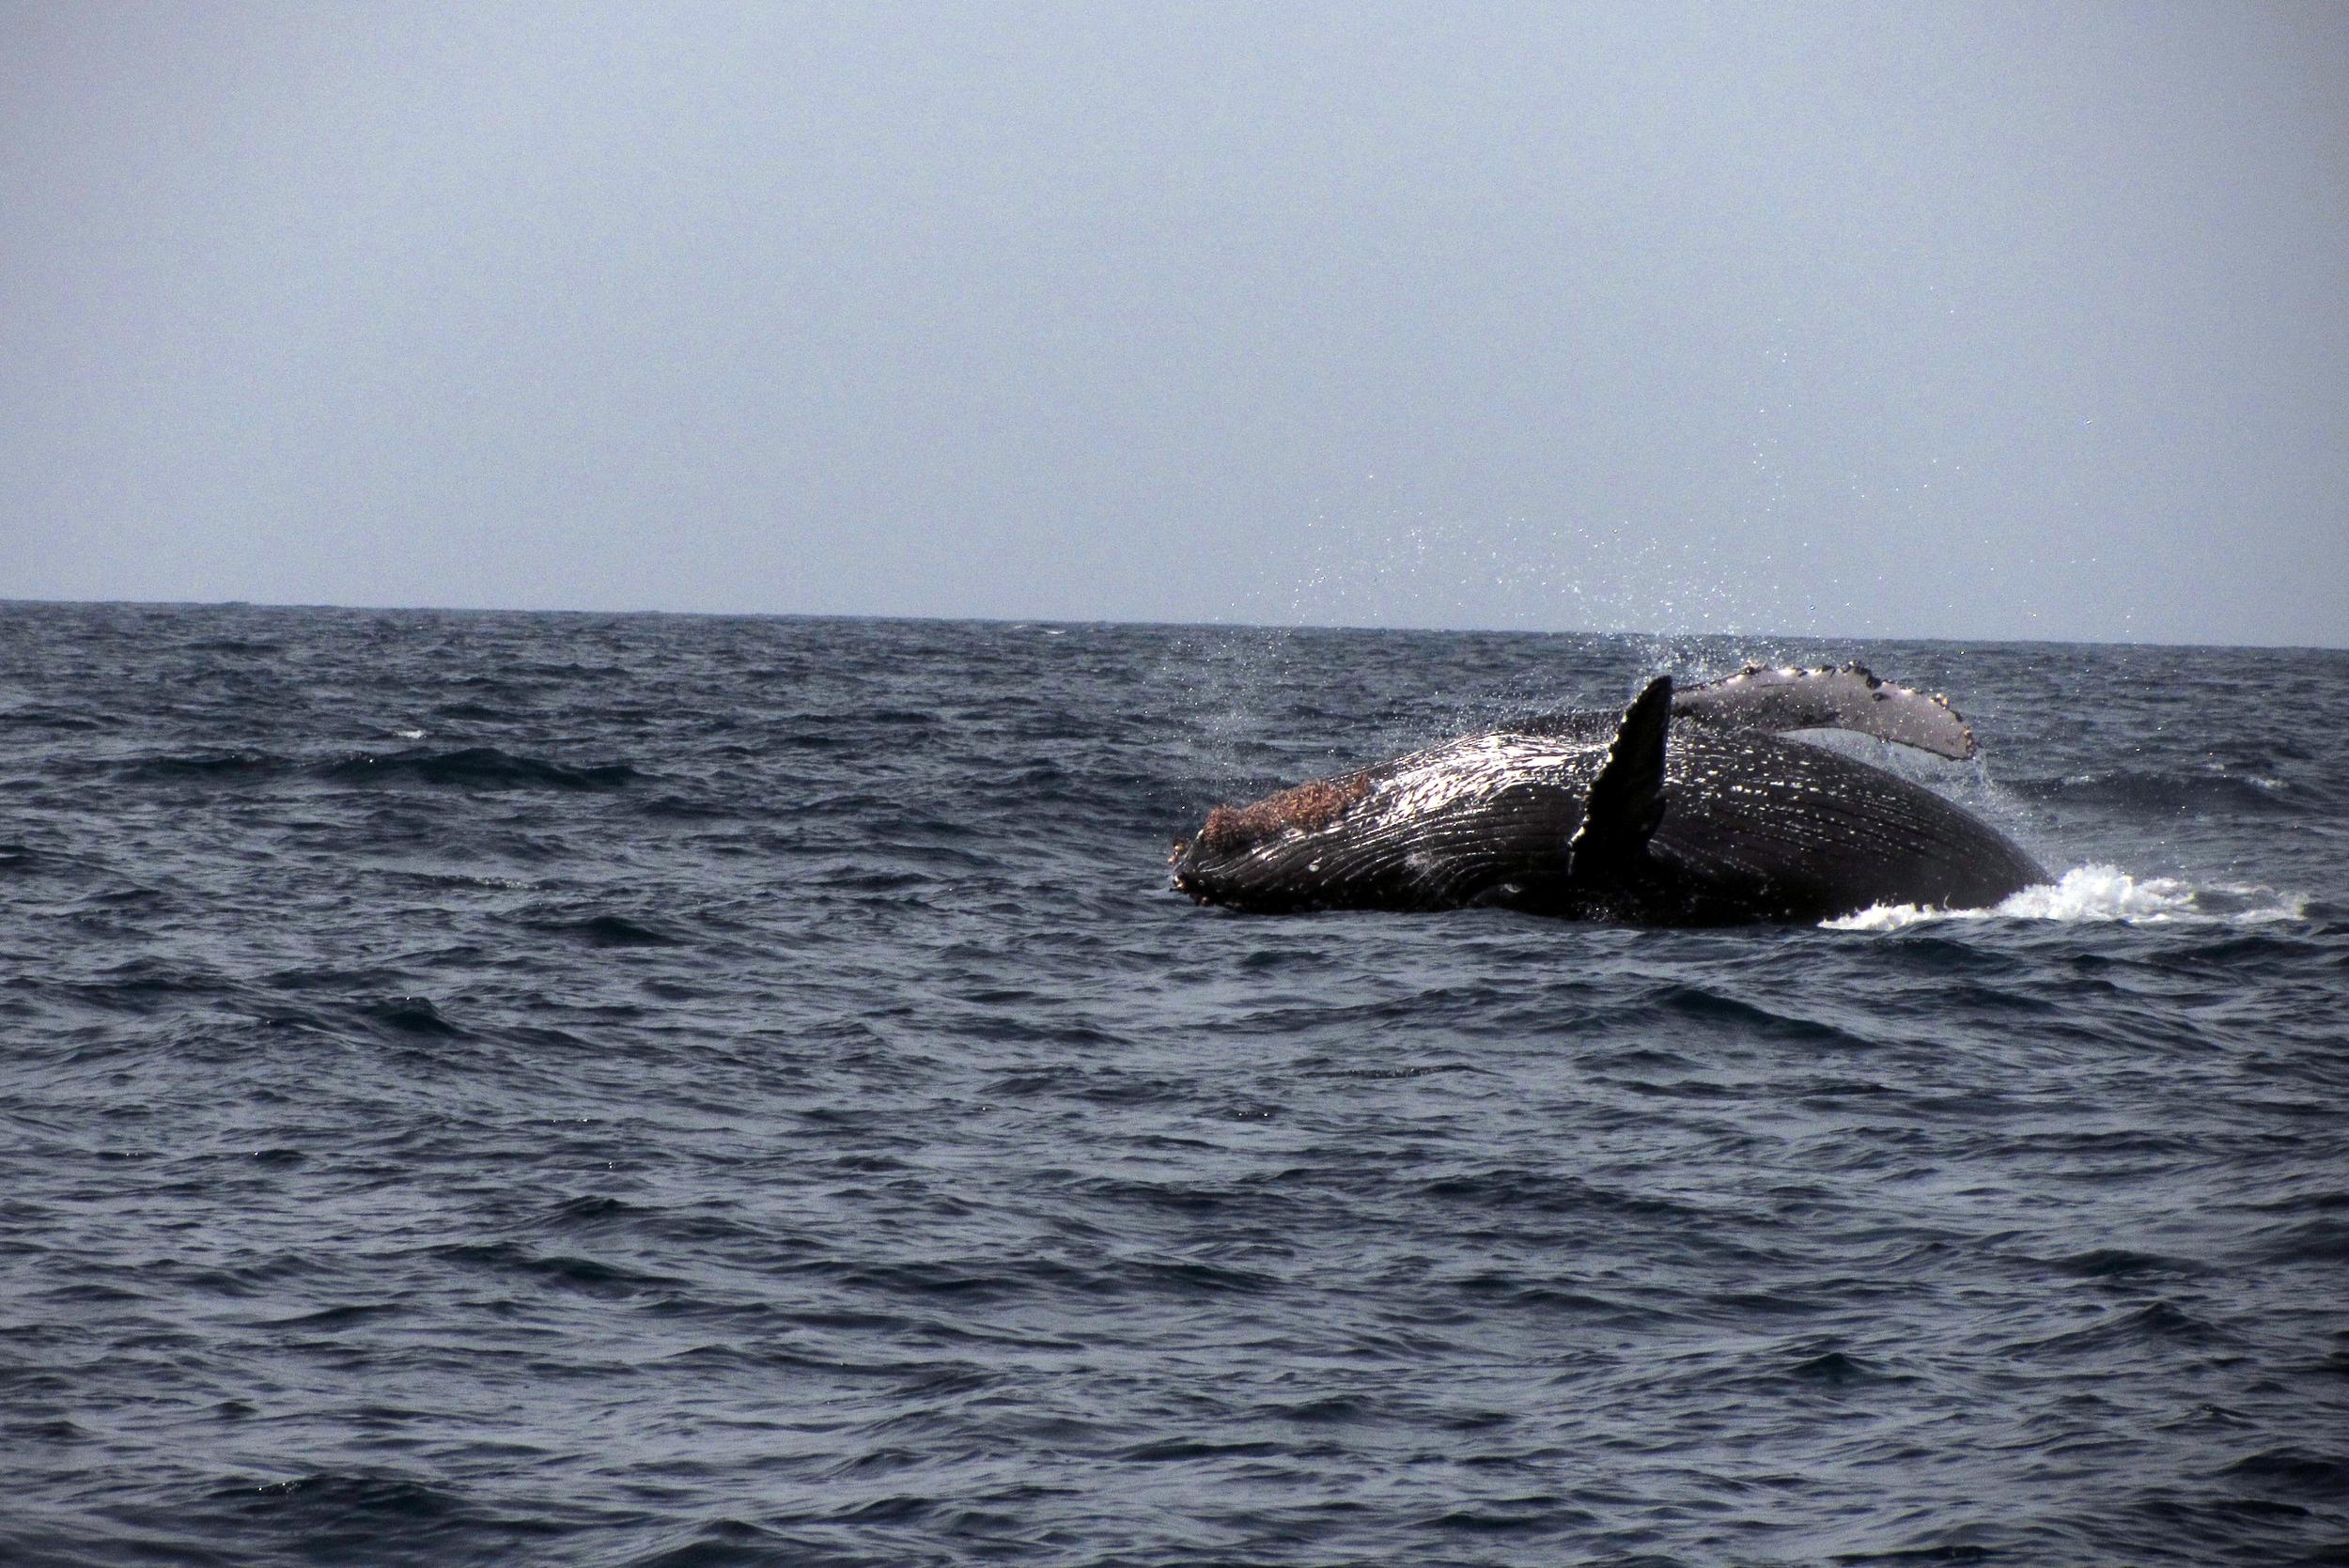 Breaching Humpback in San Diego